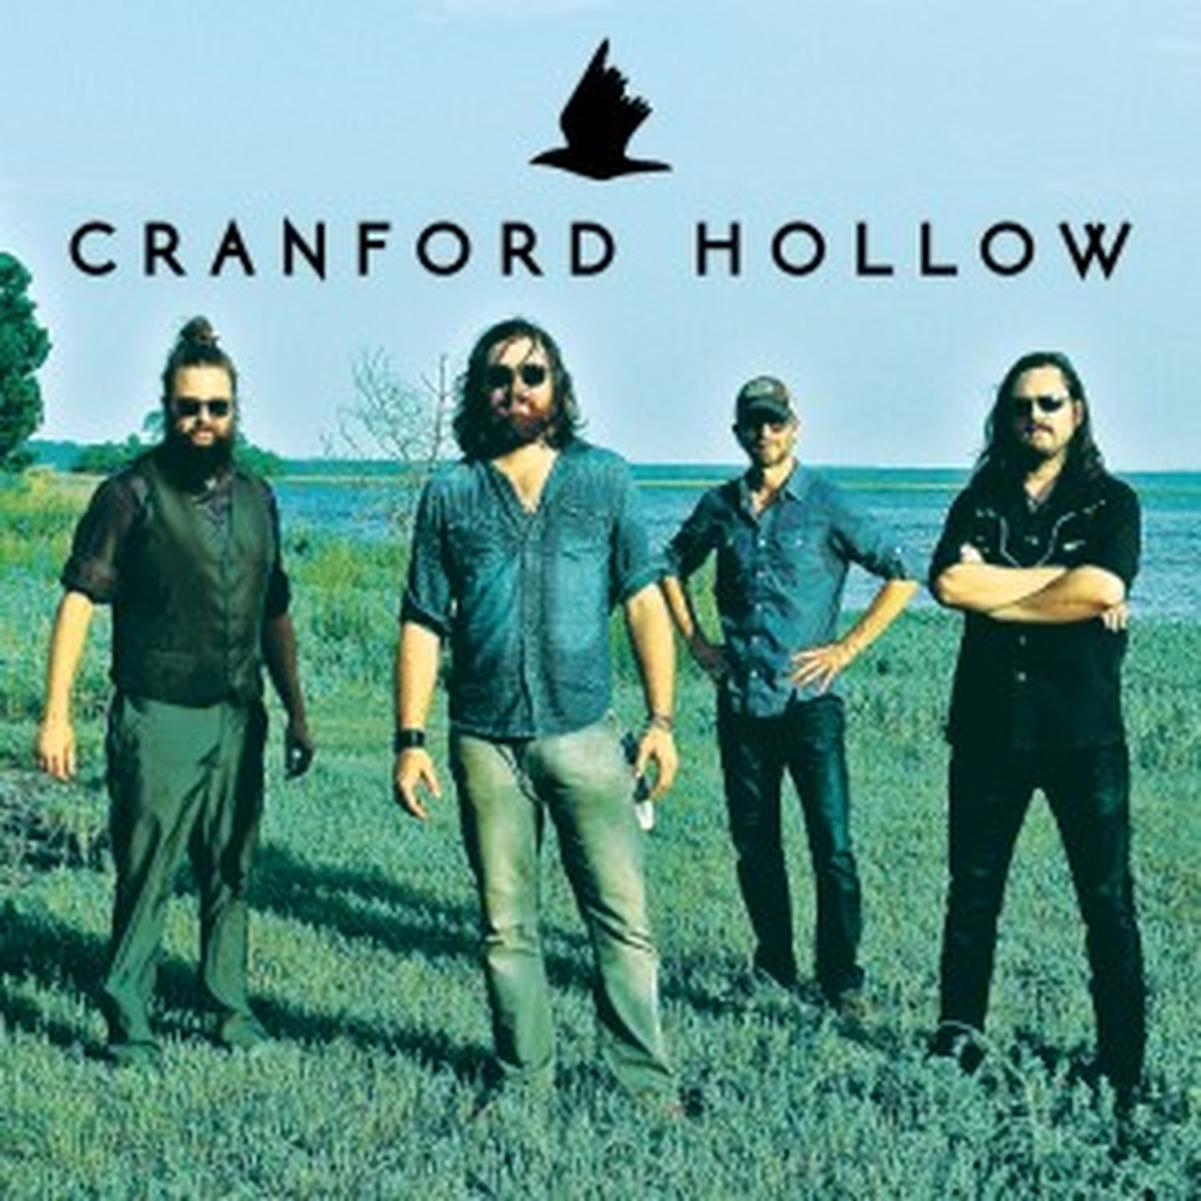 Cranford Hollow